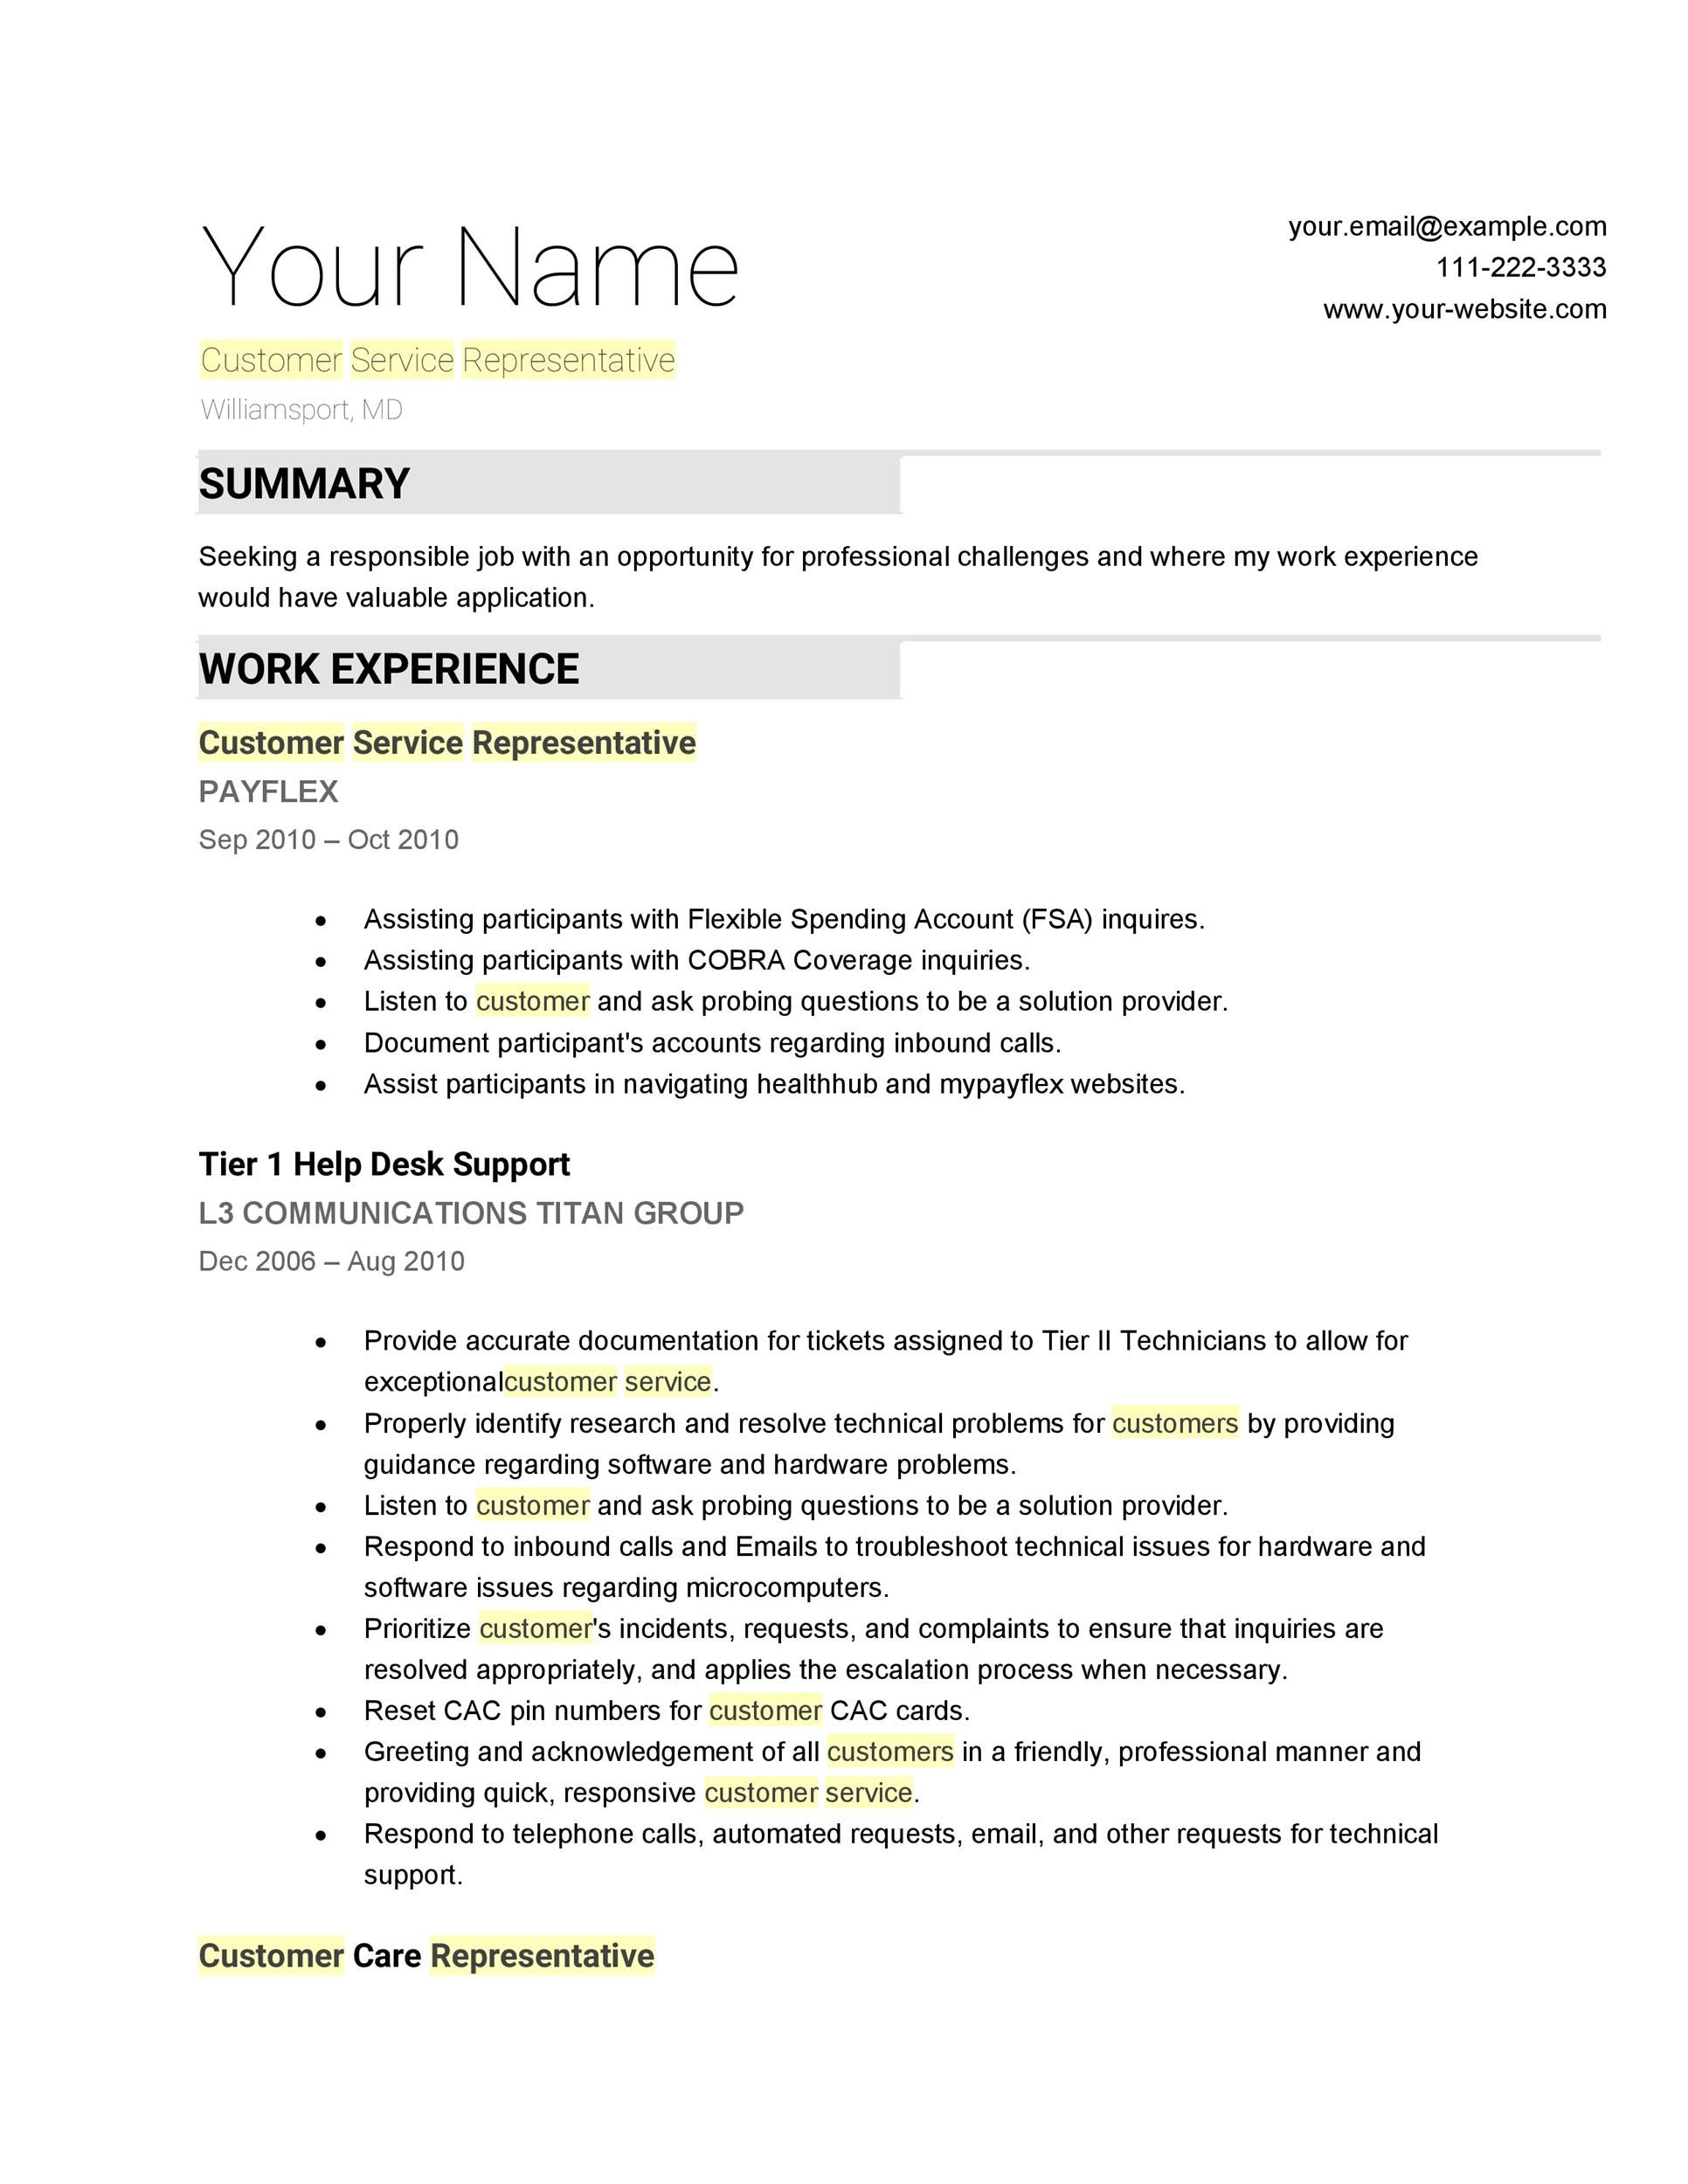 Resume templates help 1 templates example templates